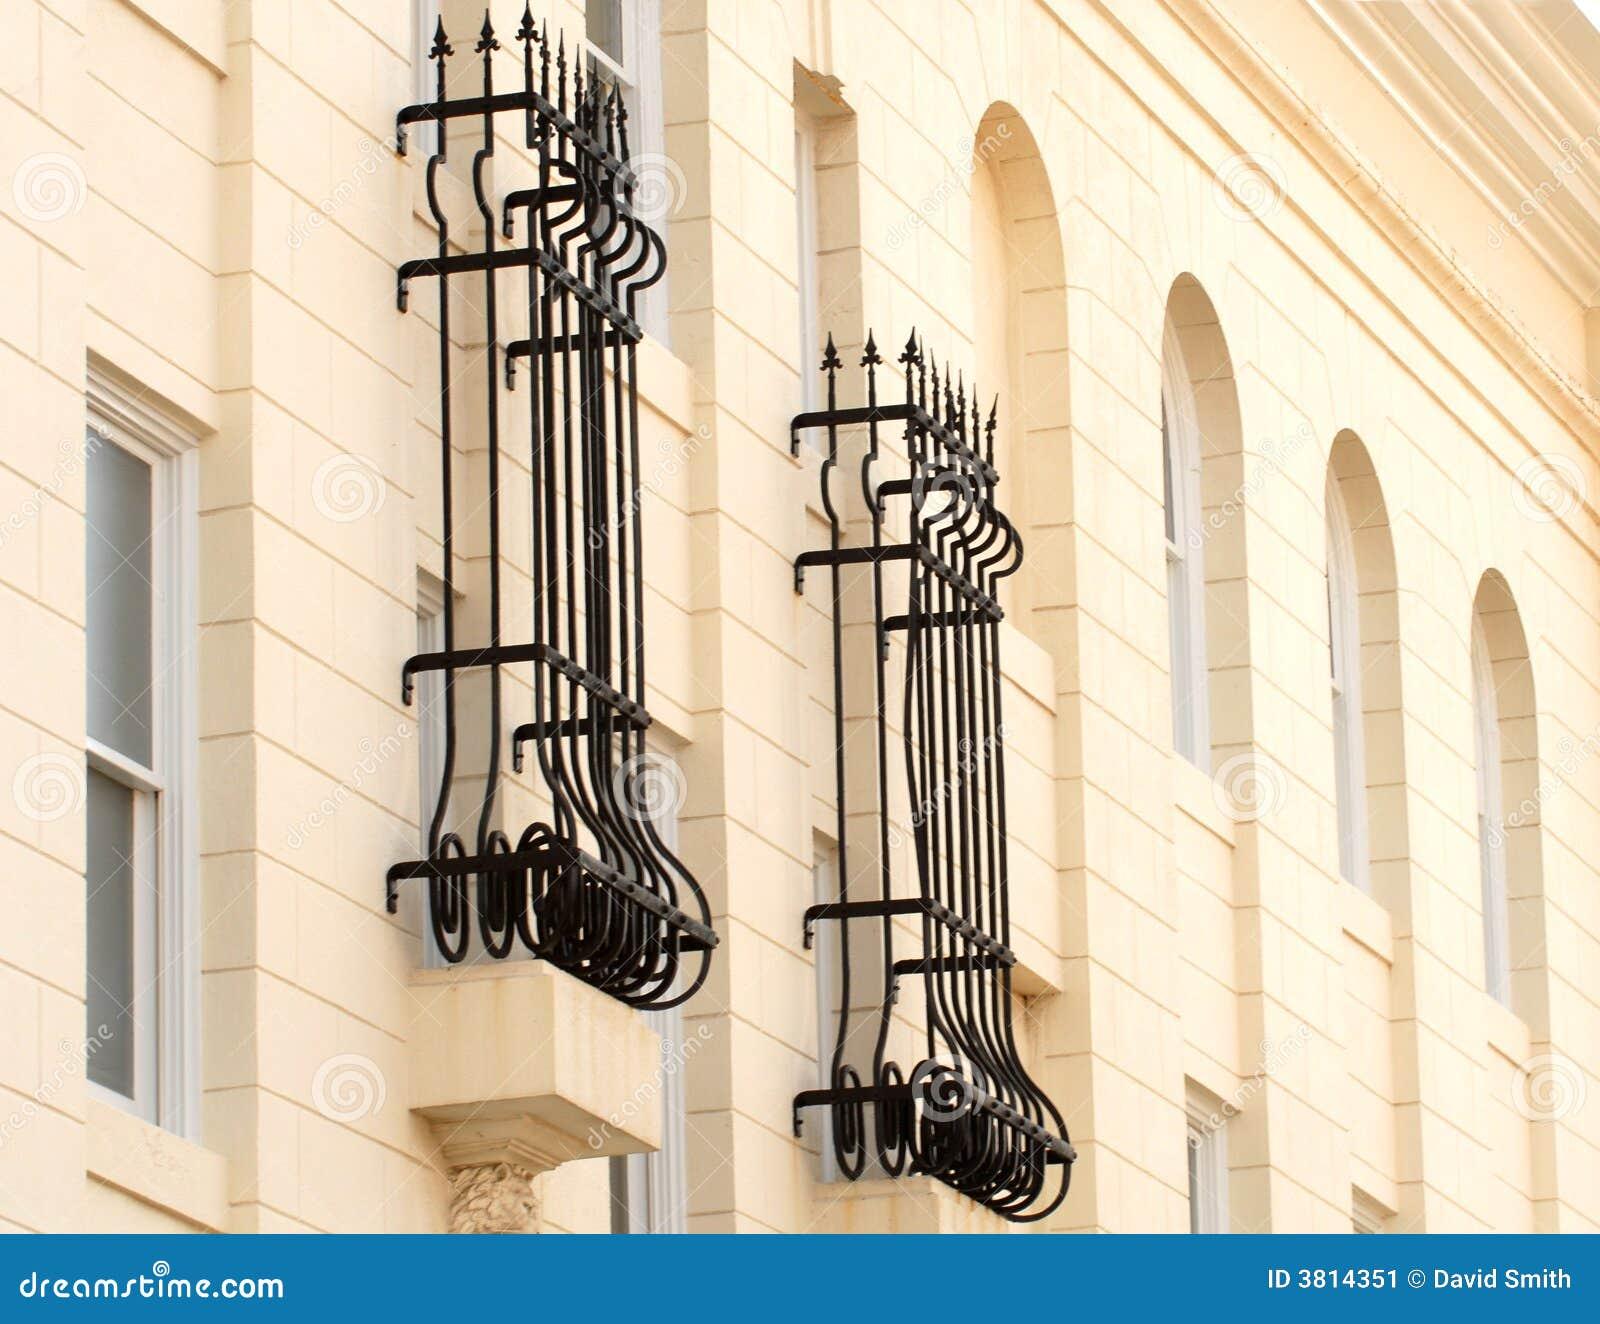 Wrought Iron Bars Around Windows Stock Image Image Of